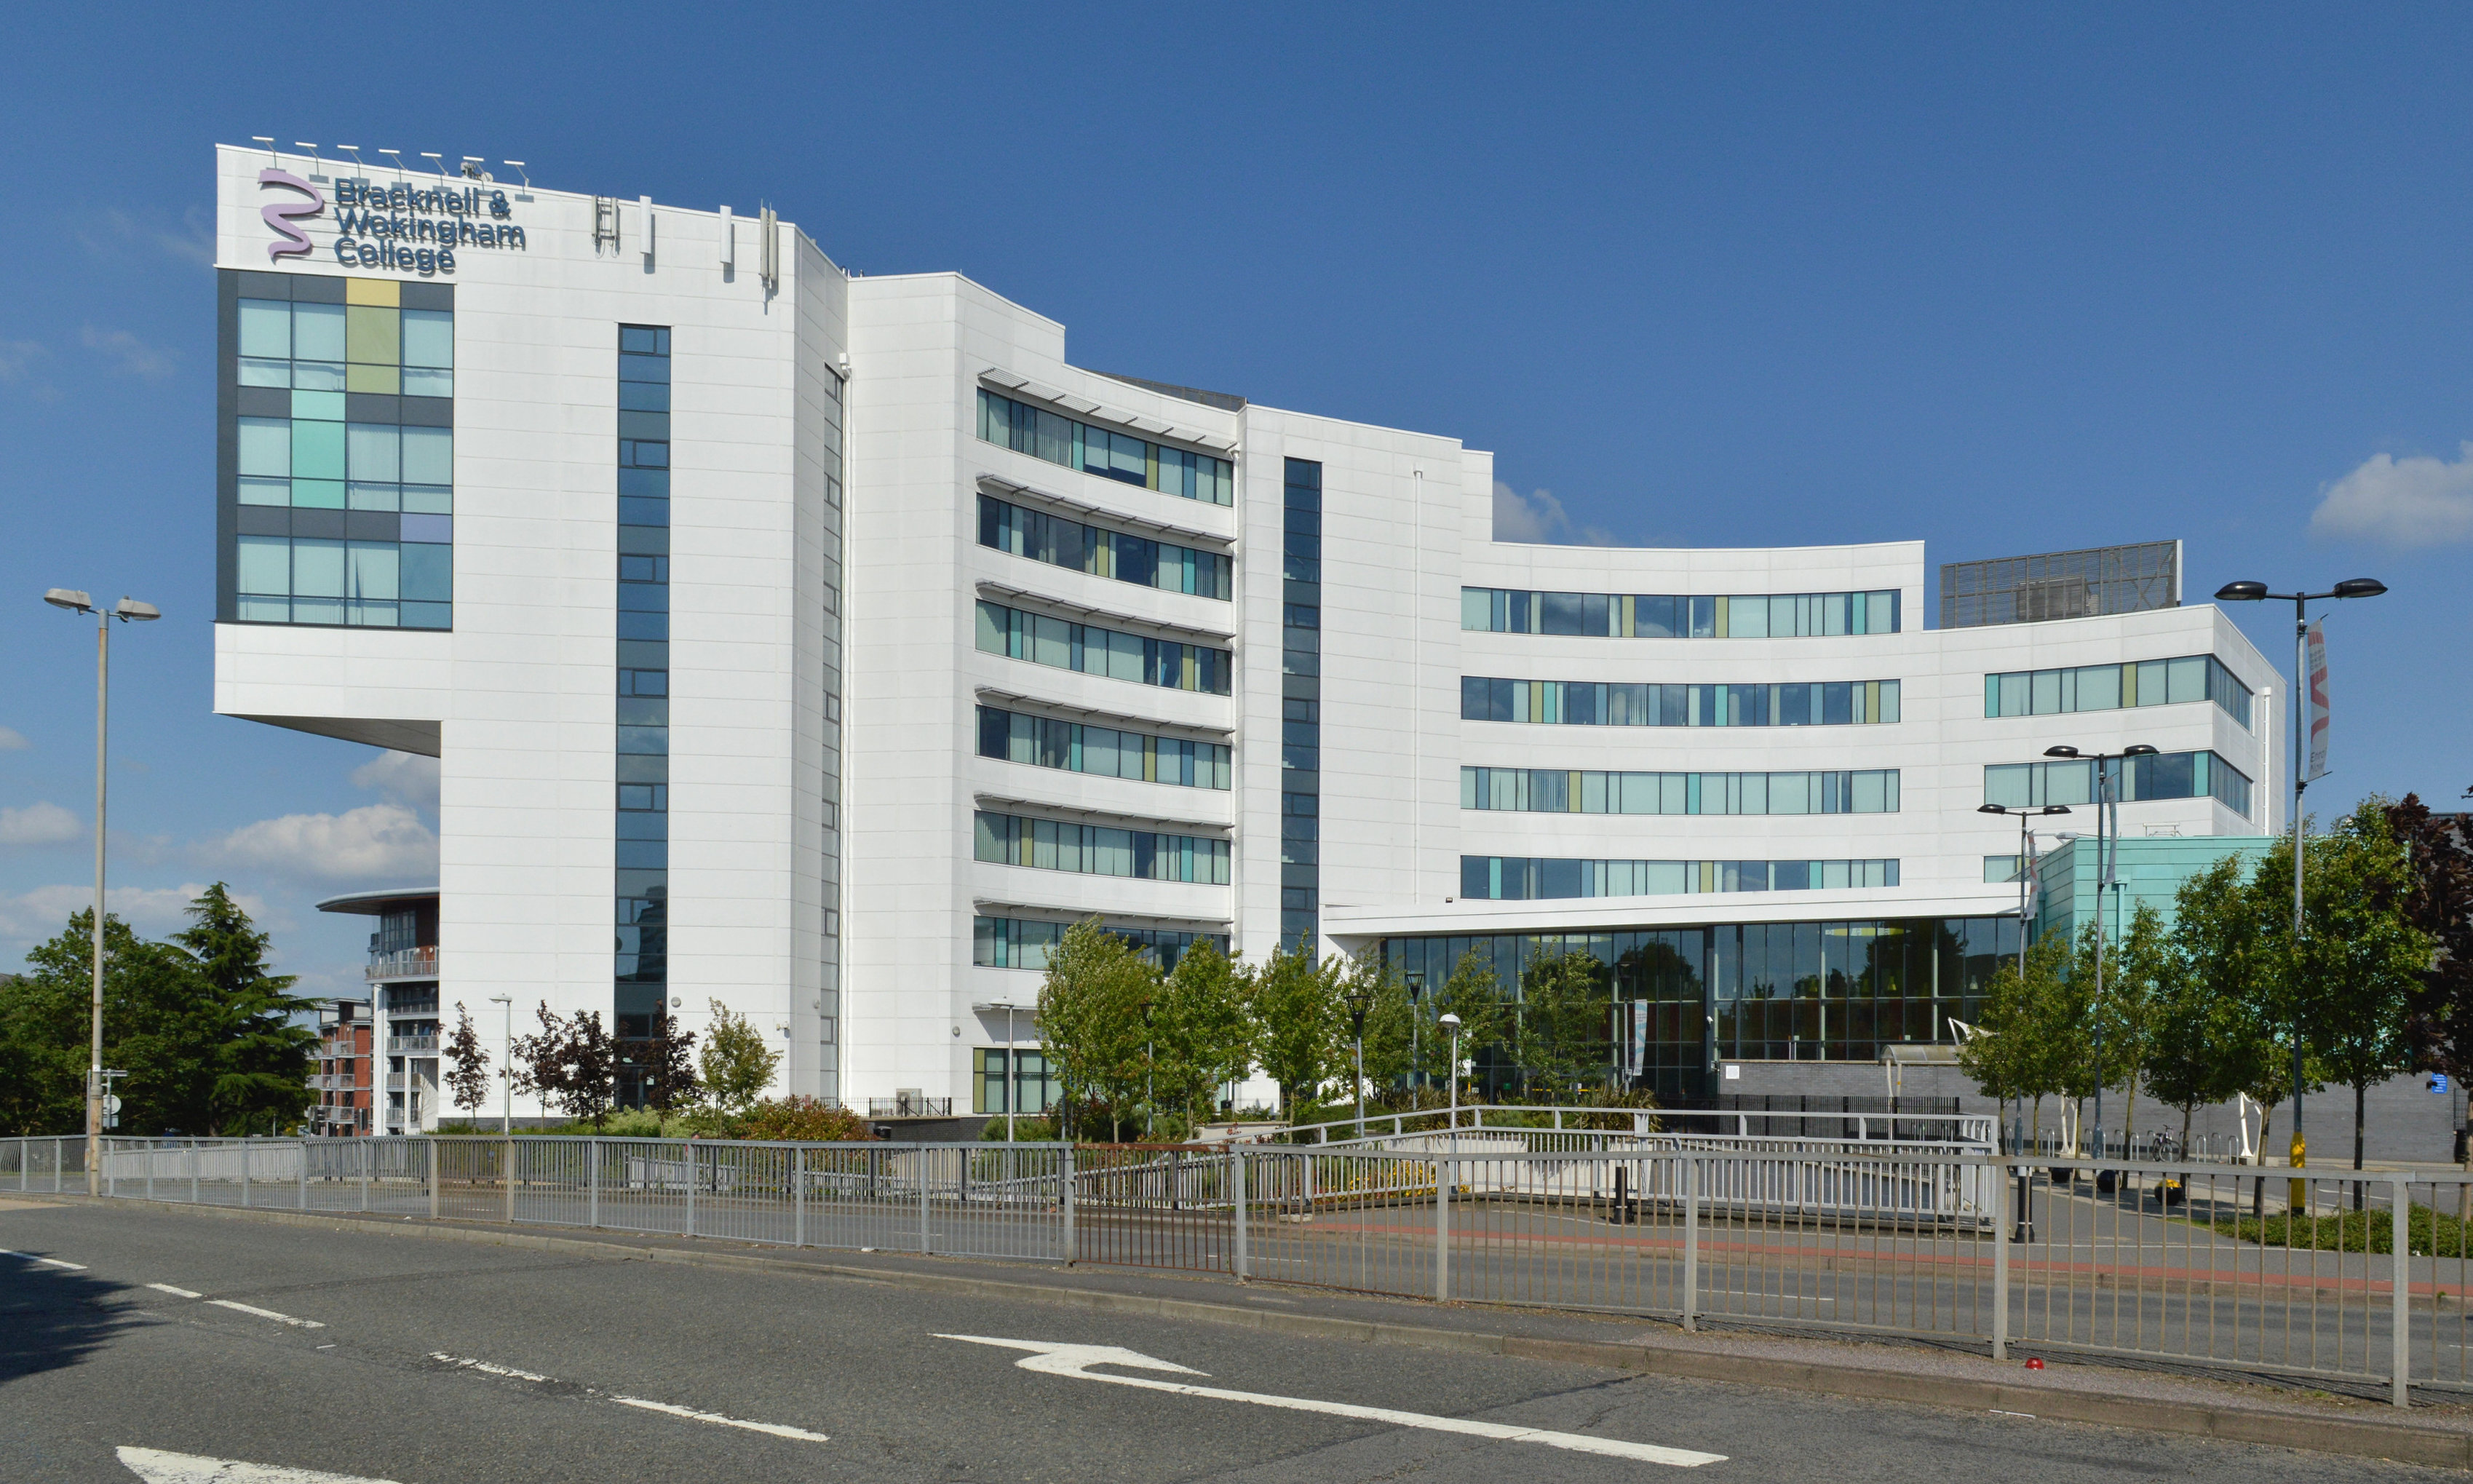 Bracknell And Wokingham College Wikipedia